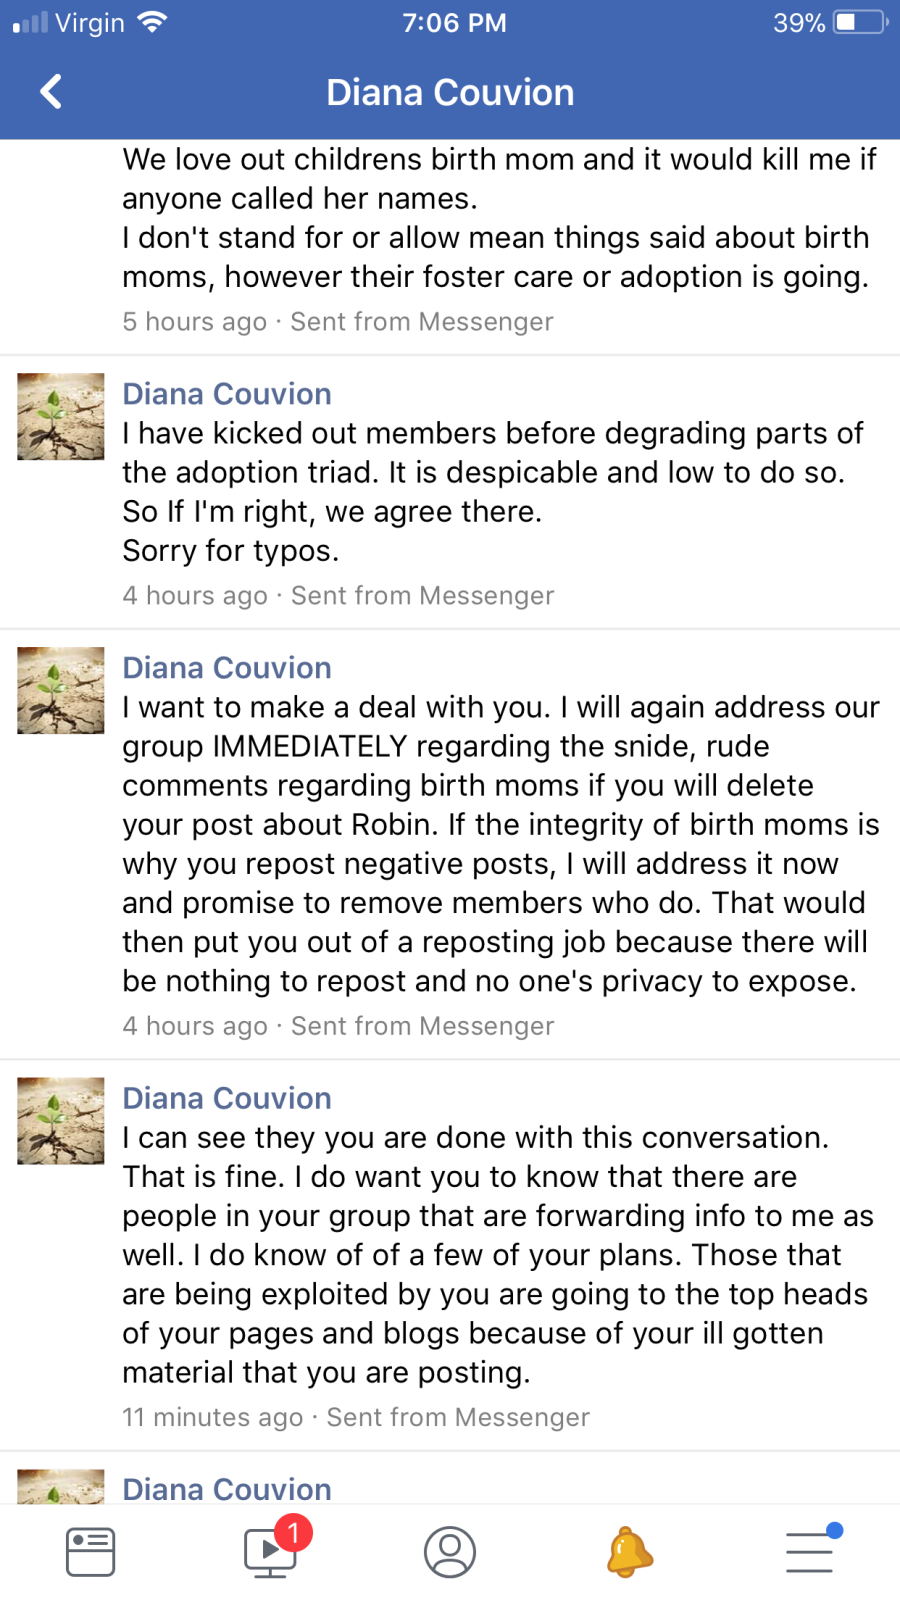 diana message 3